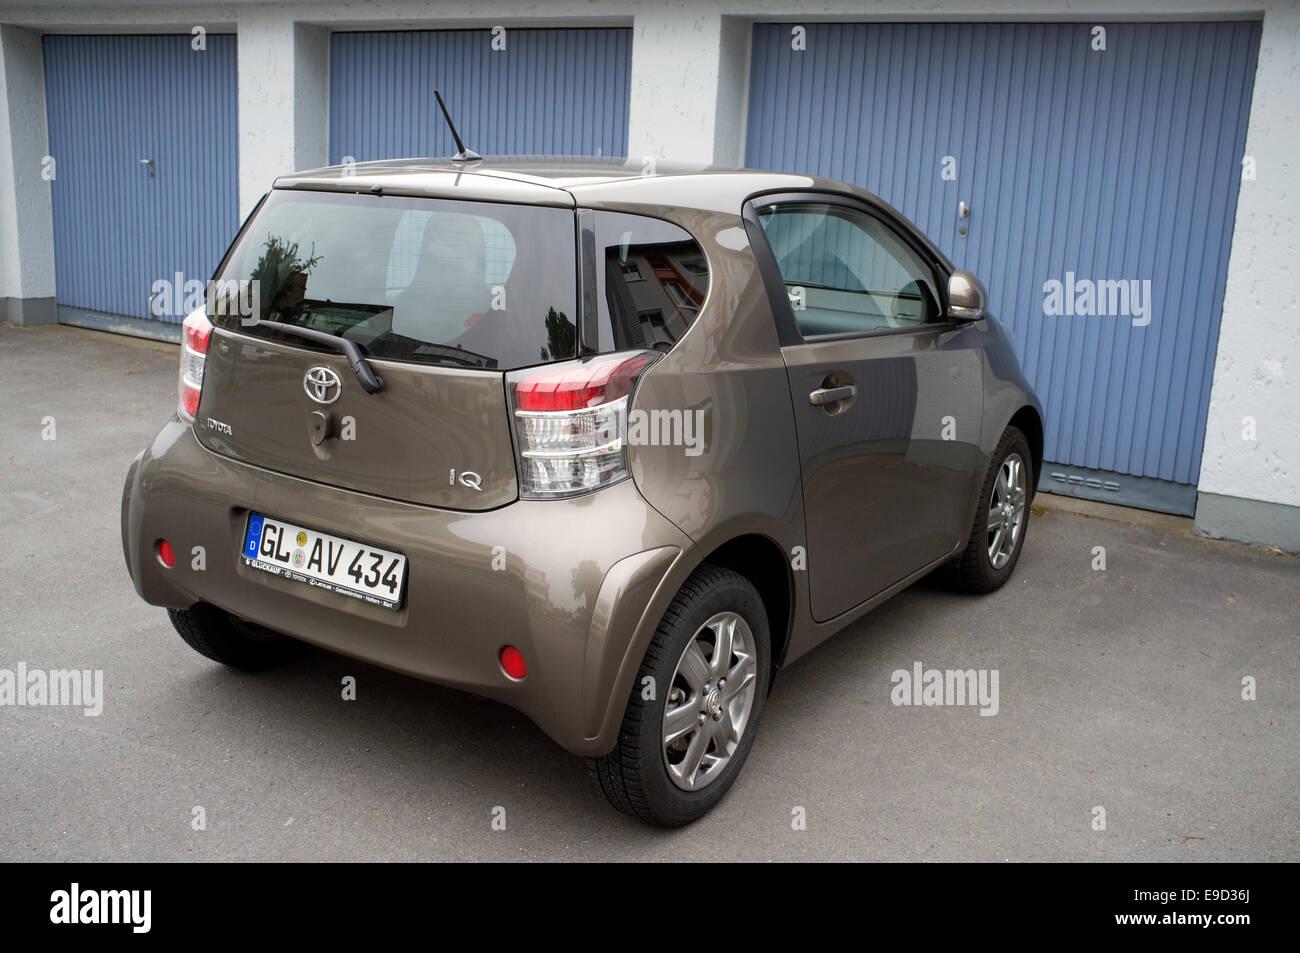 2-Sitzer Toyota IQ Auto Stockfoto, Bild: 74661290 - Alamy